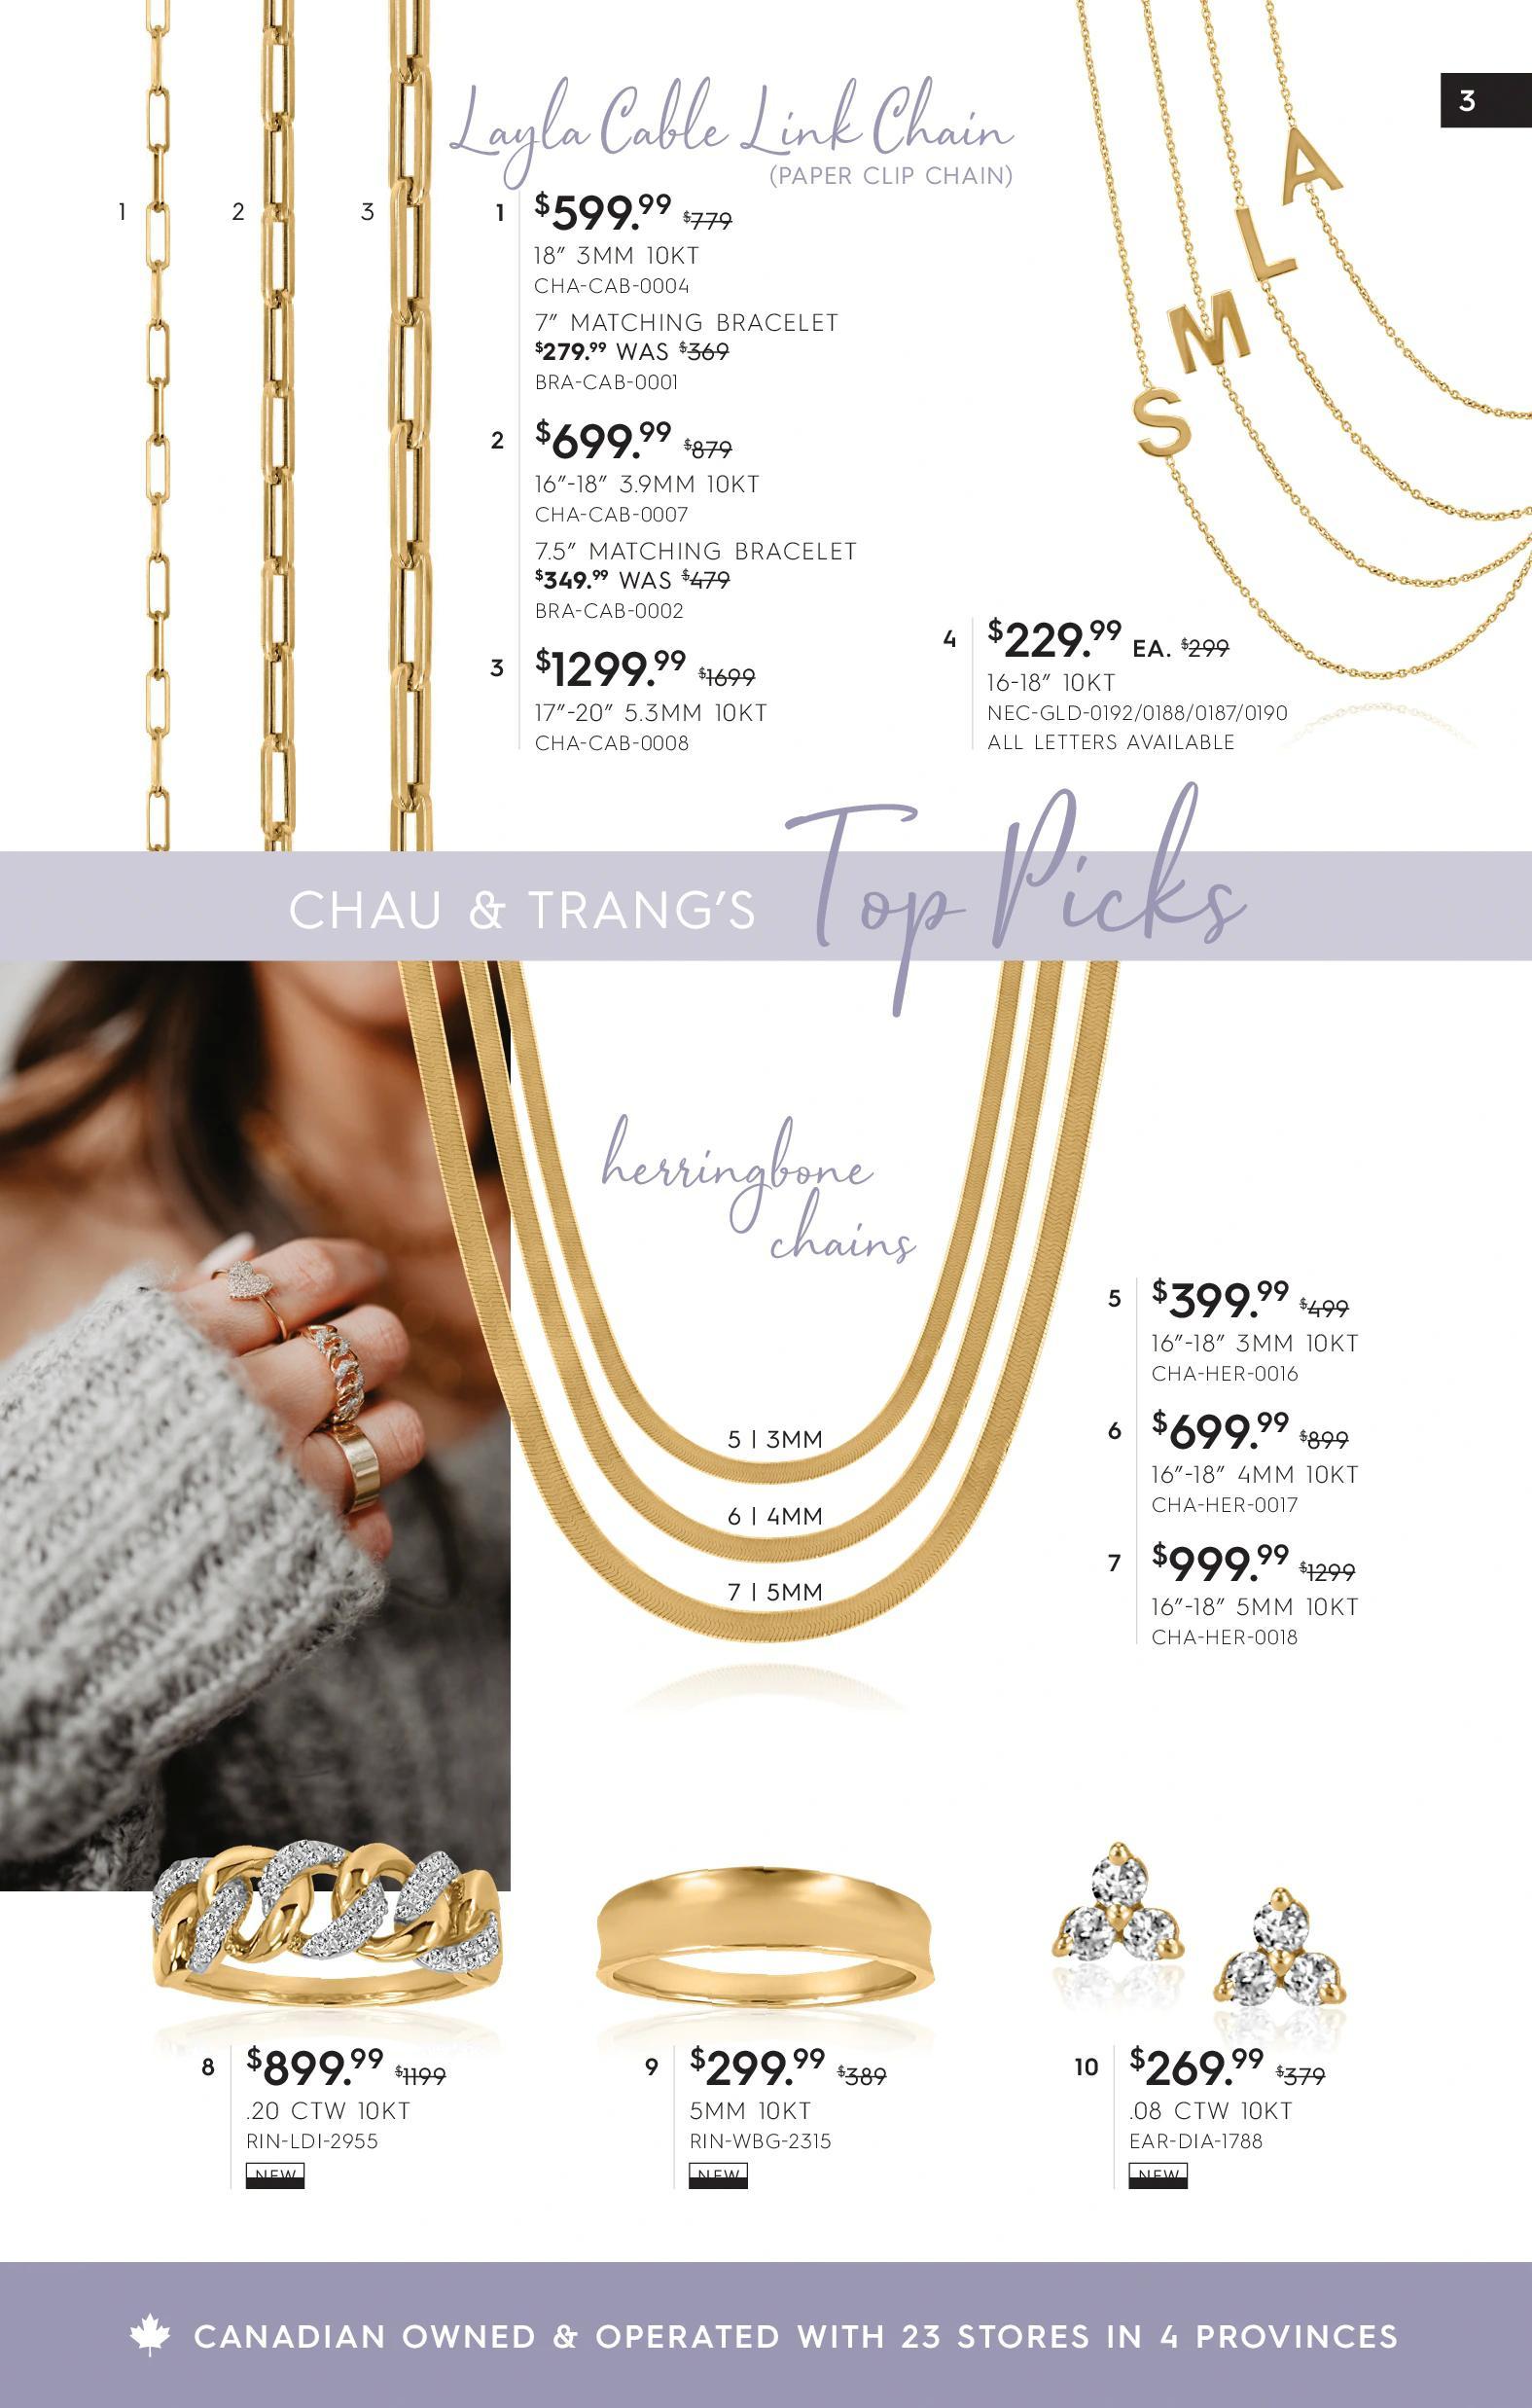 Paris Jewellers - Monthly Savings - Page 3